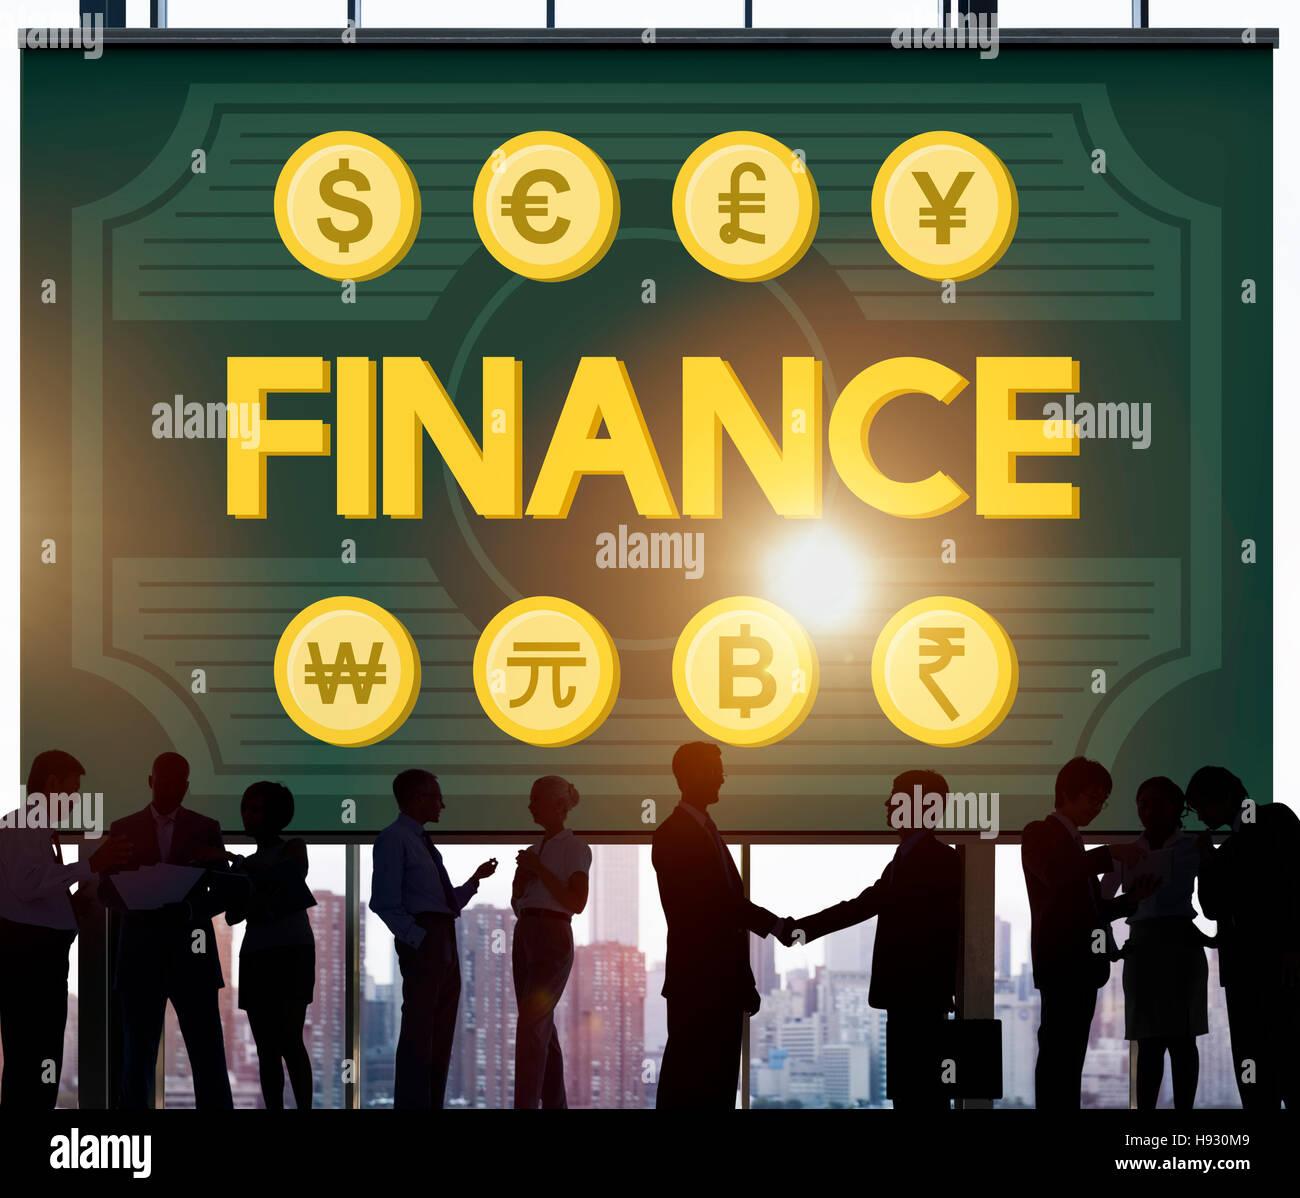 Finance foreign exchange money symbol concept stock photo royalty finance foreign exchange money symbol concept buycottarizona